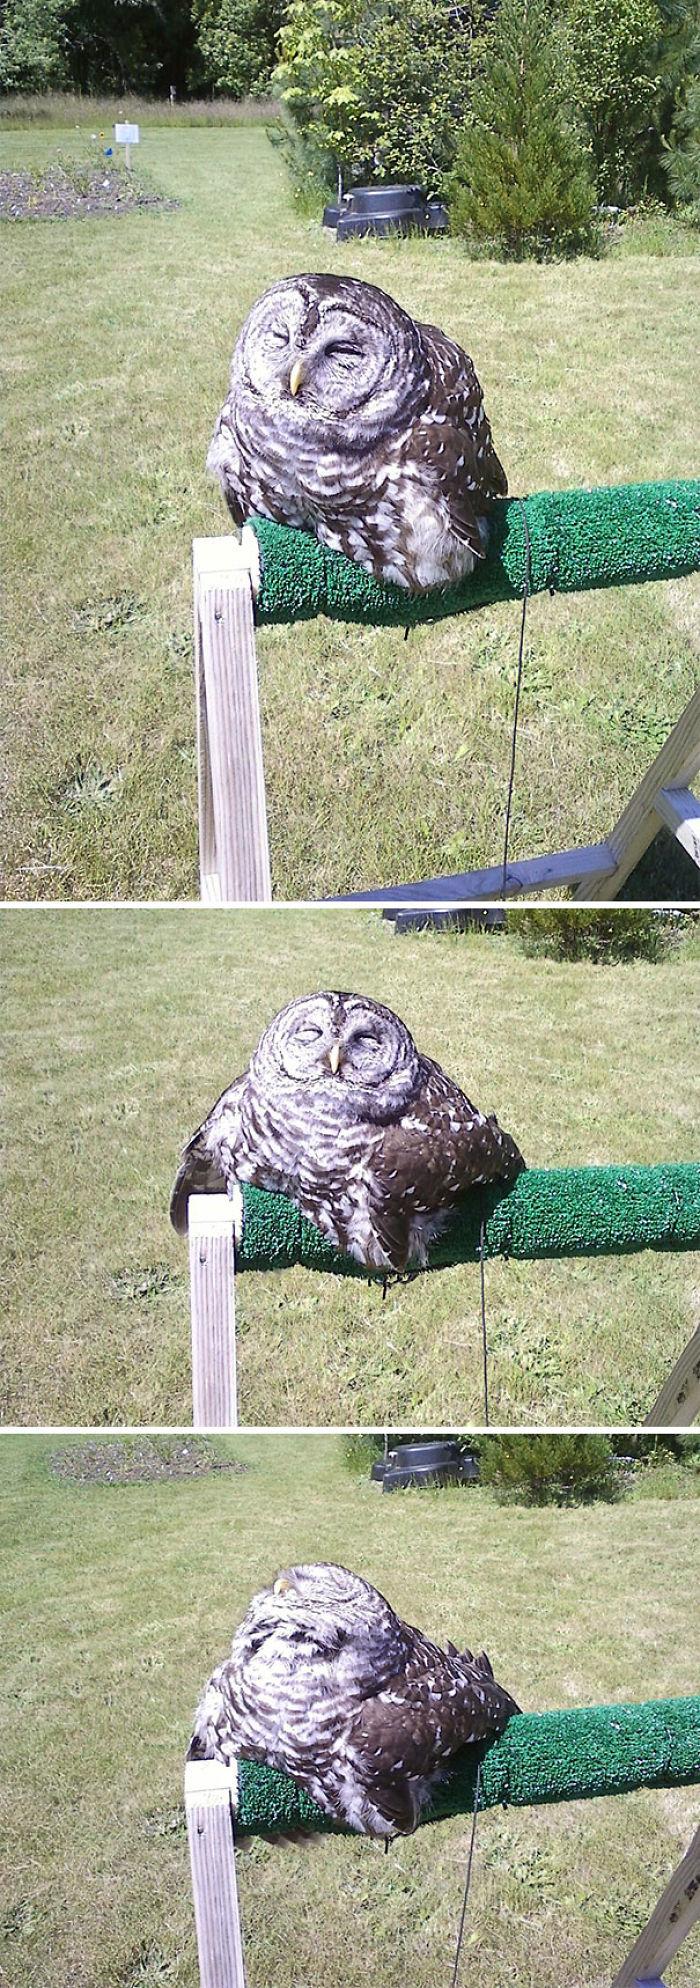 Apparently Owls Melt In Direct Sunligh